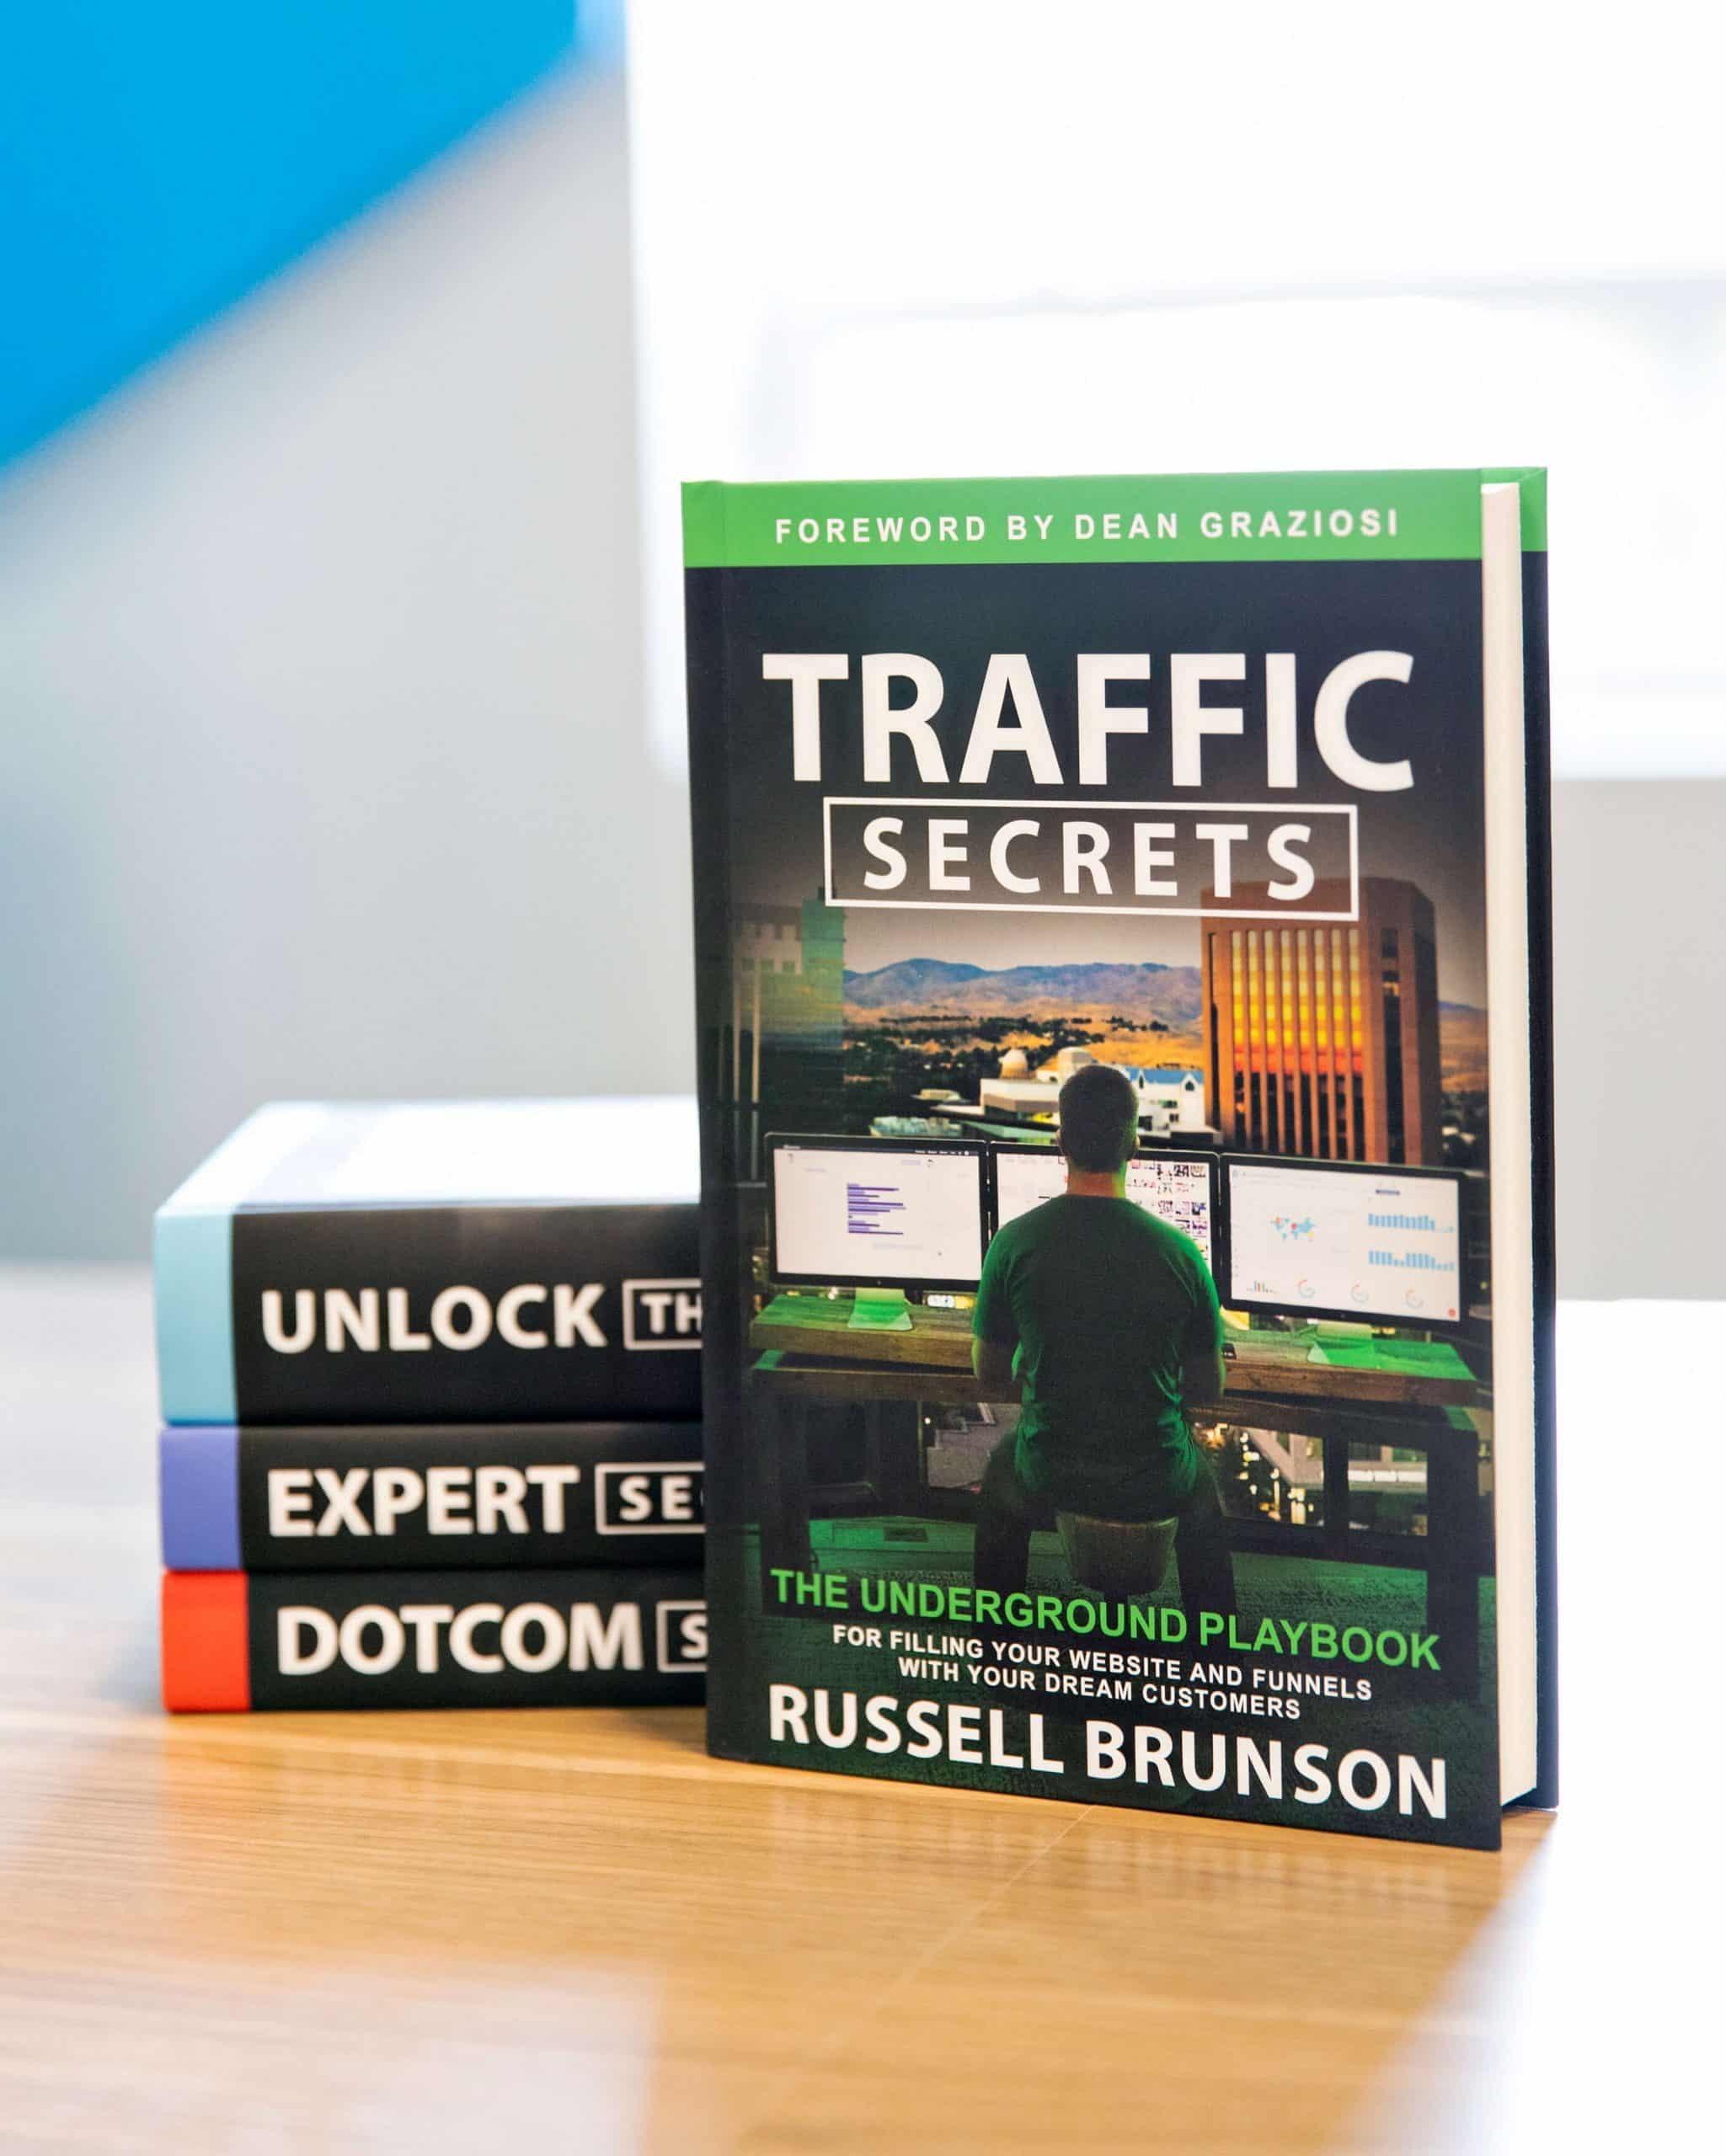 Trilogy Secrets Books tiffanieanne.com - Tiffanie Anne Blog